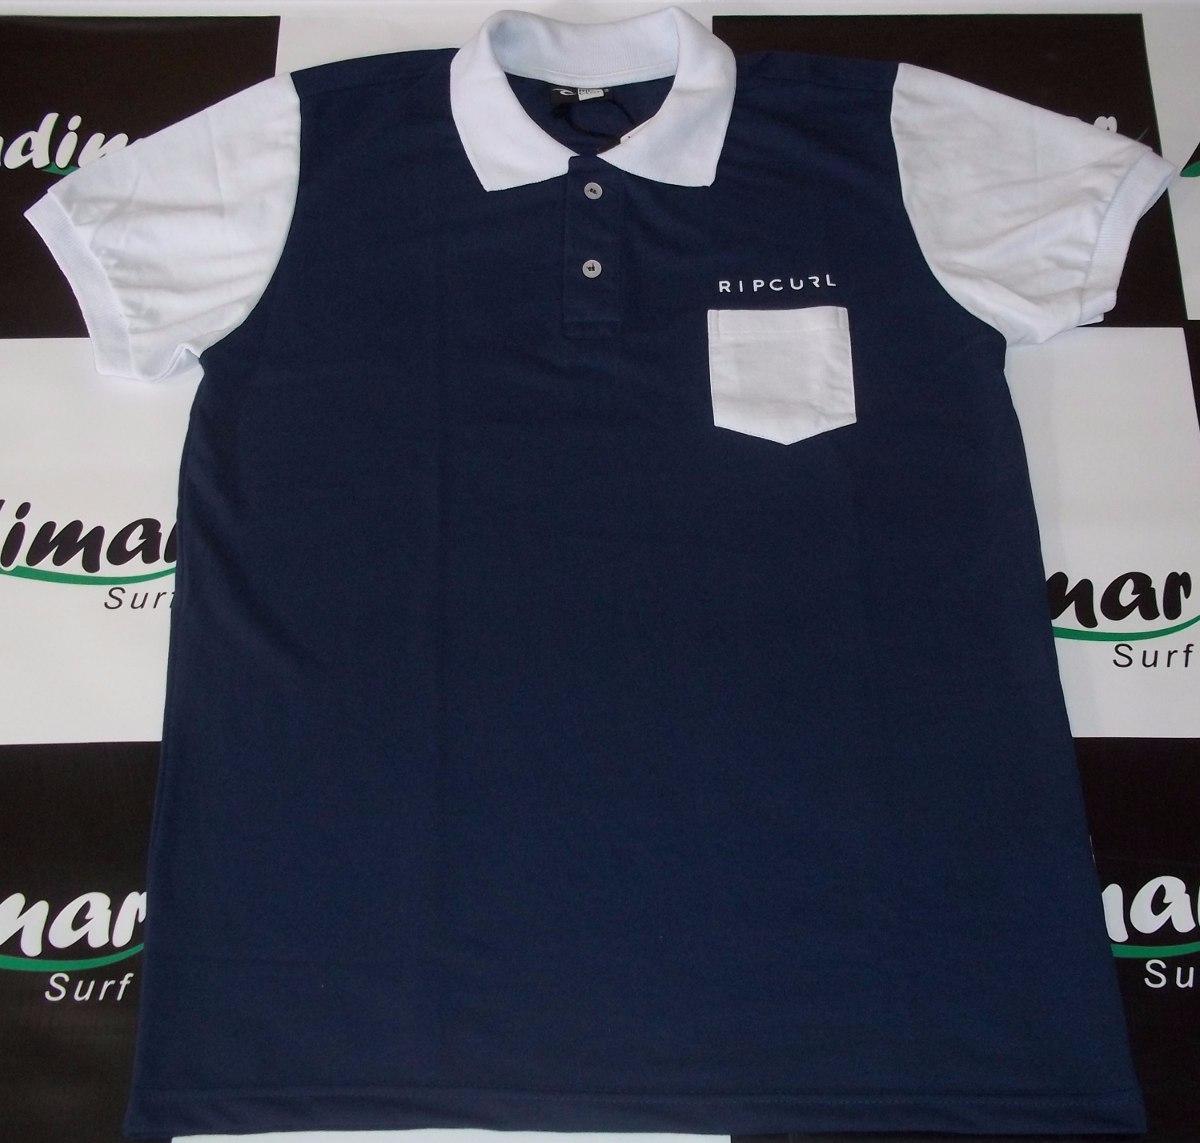 Camisa Polo Rip Curl Original Masculina Top Marca Grife Surf - R  97 ... f208fd9e1e1